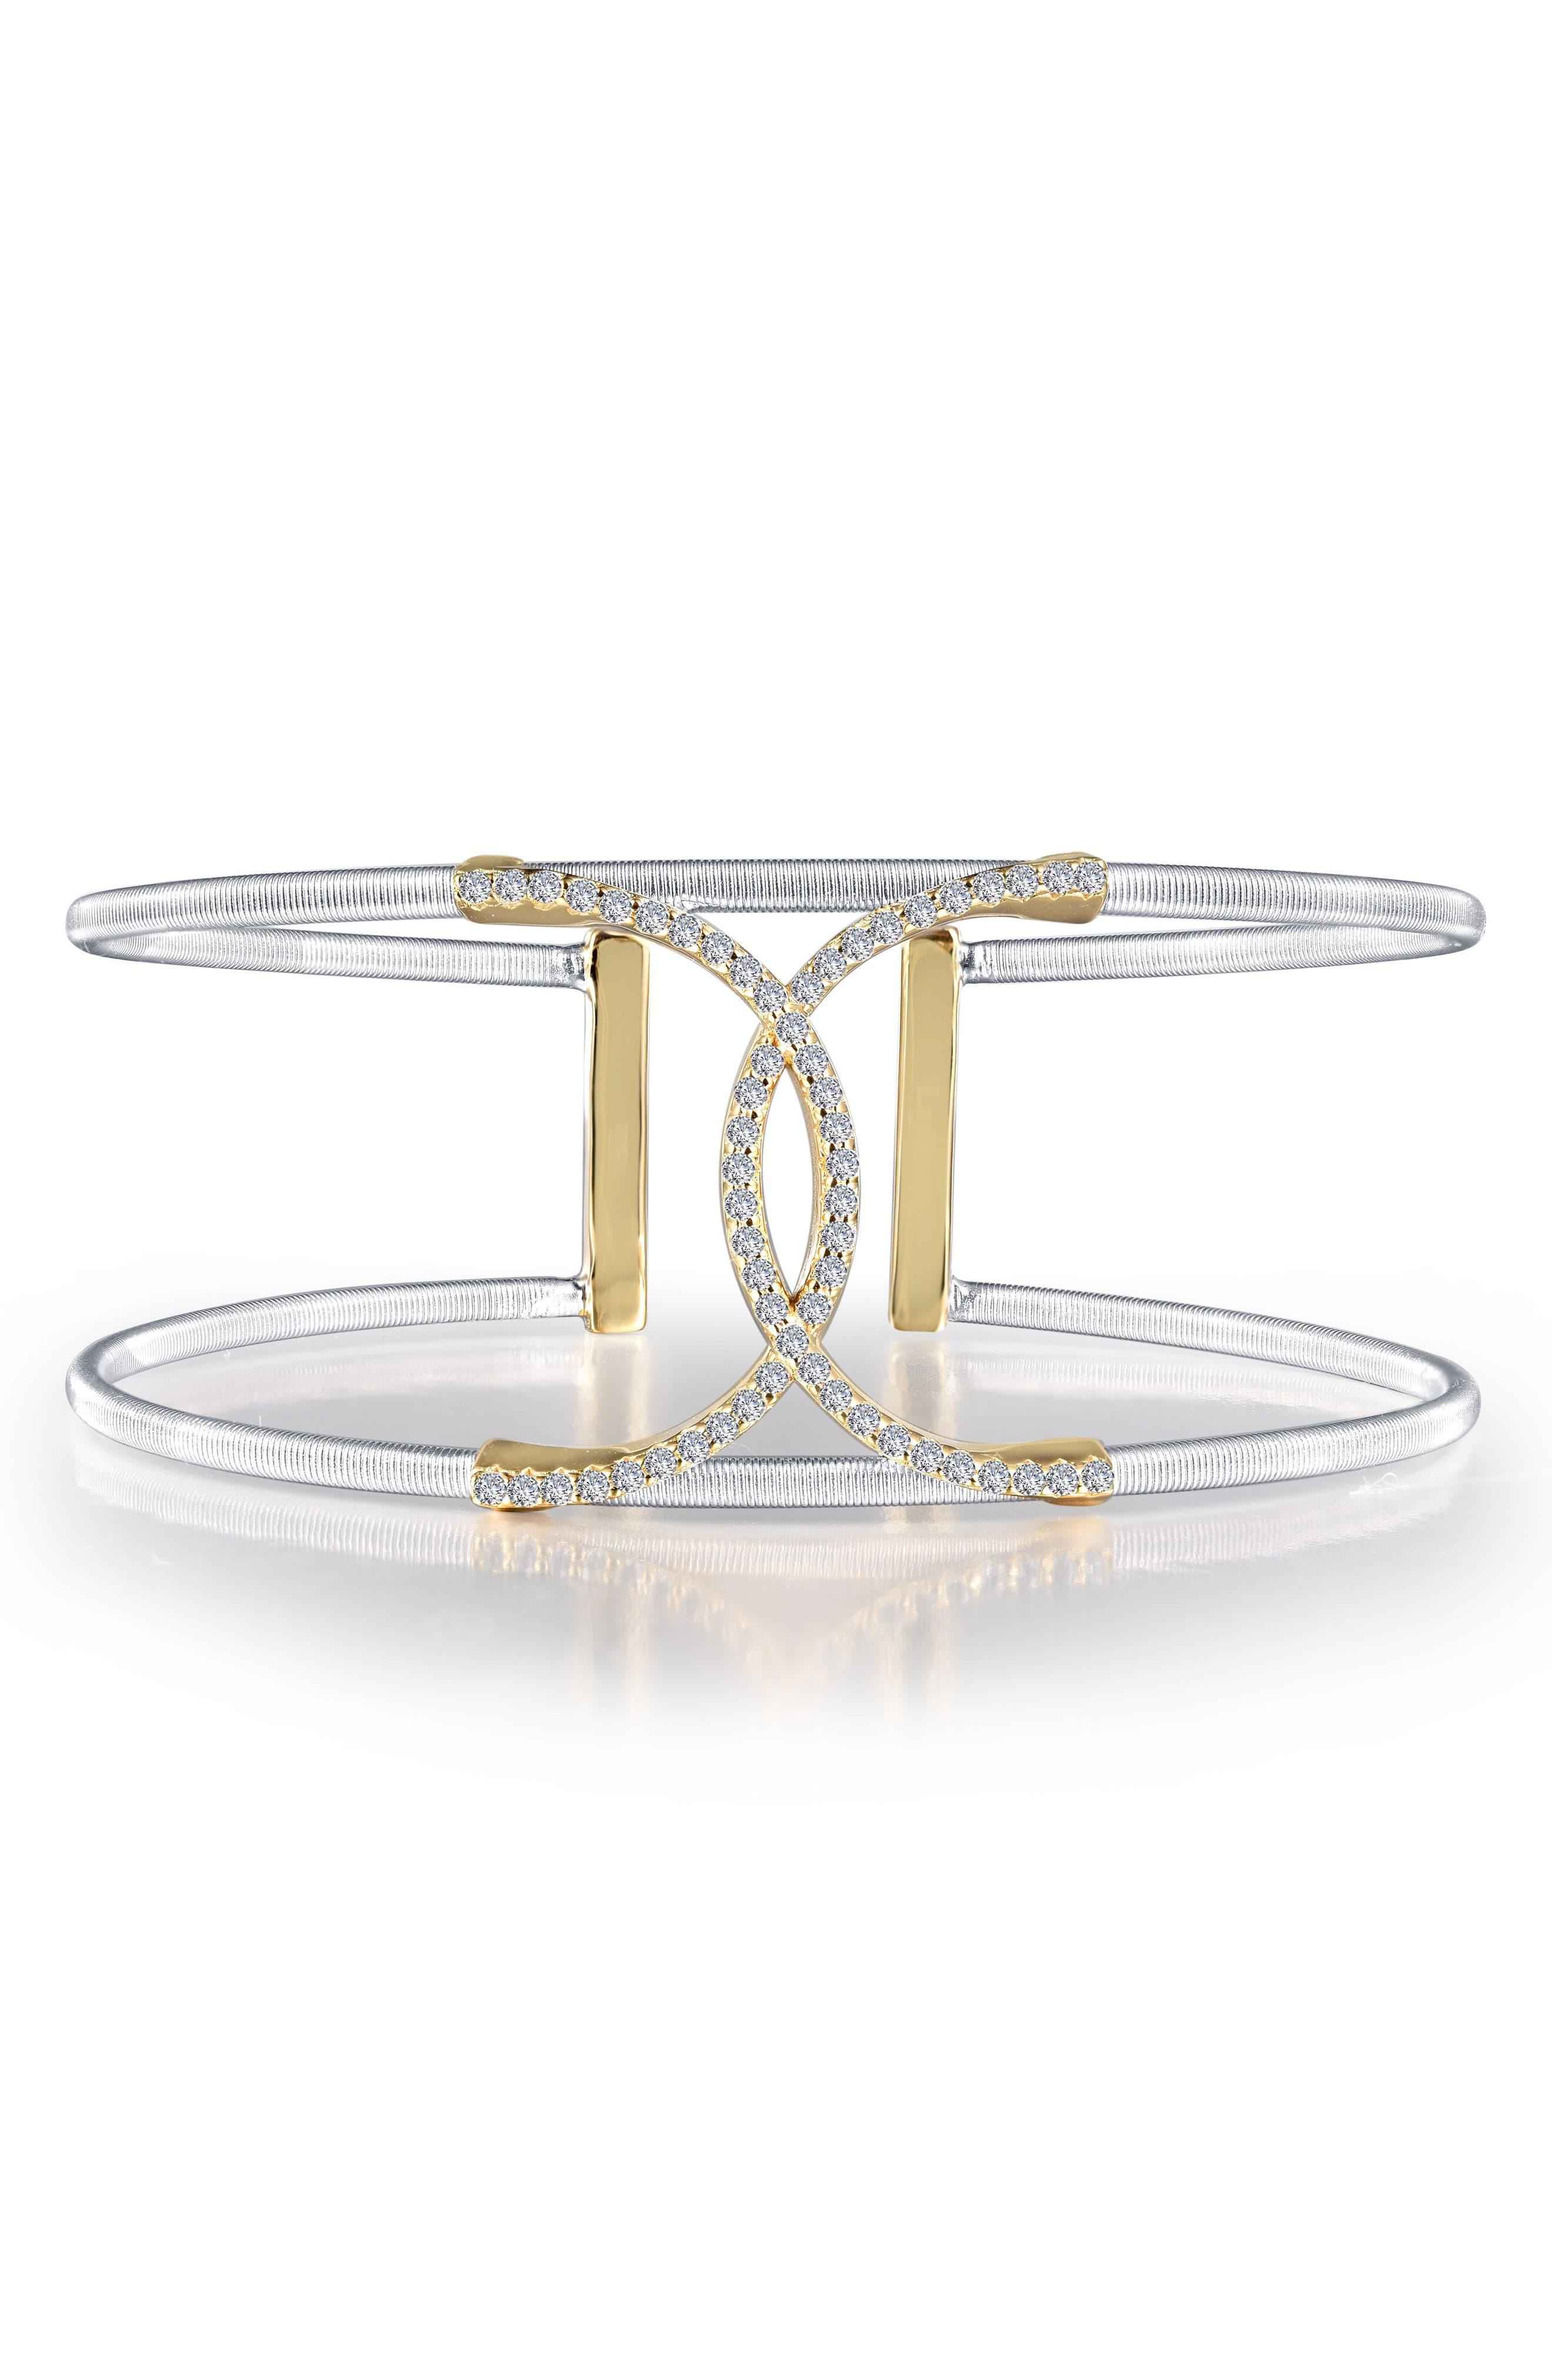 Simulated Diamond Cuff,                         Main,                         color, Two Tone/ Clear